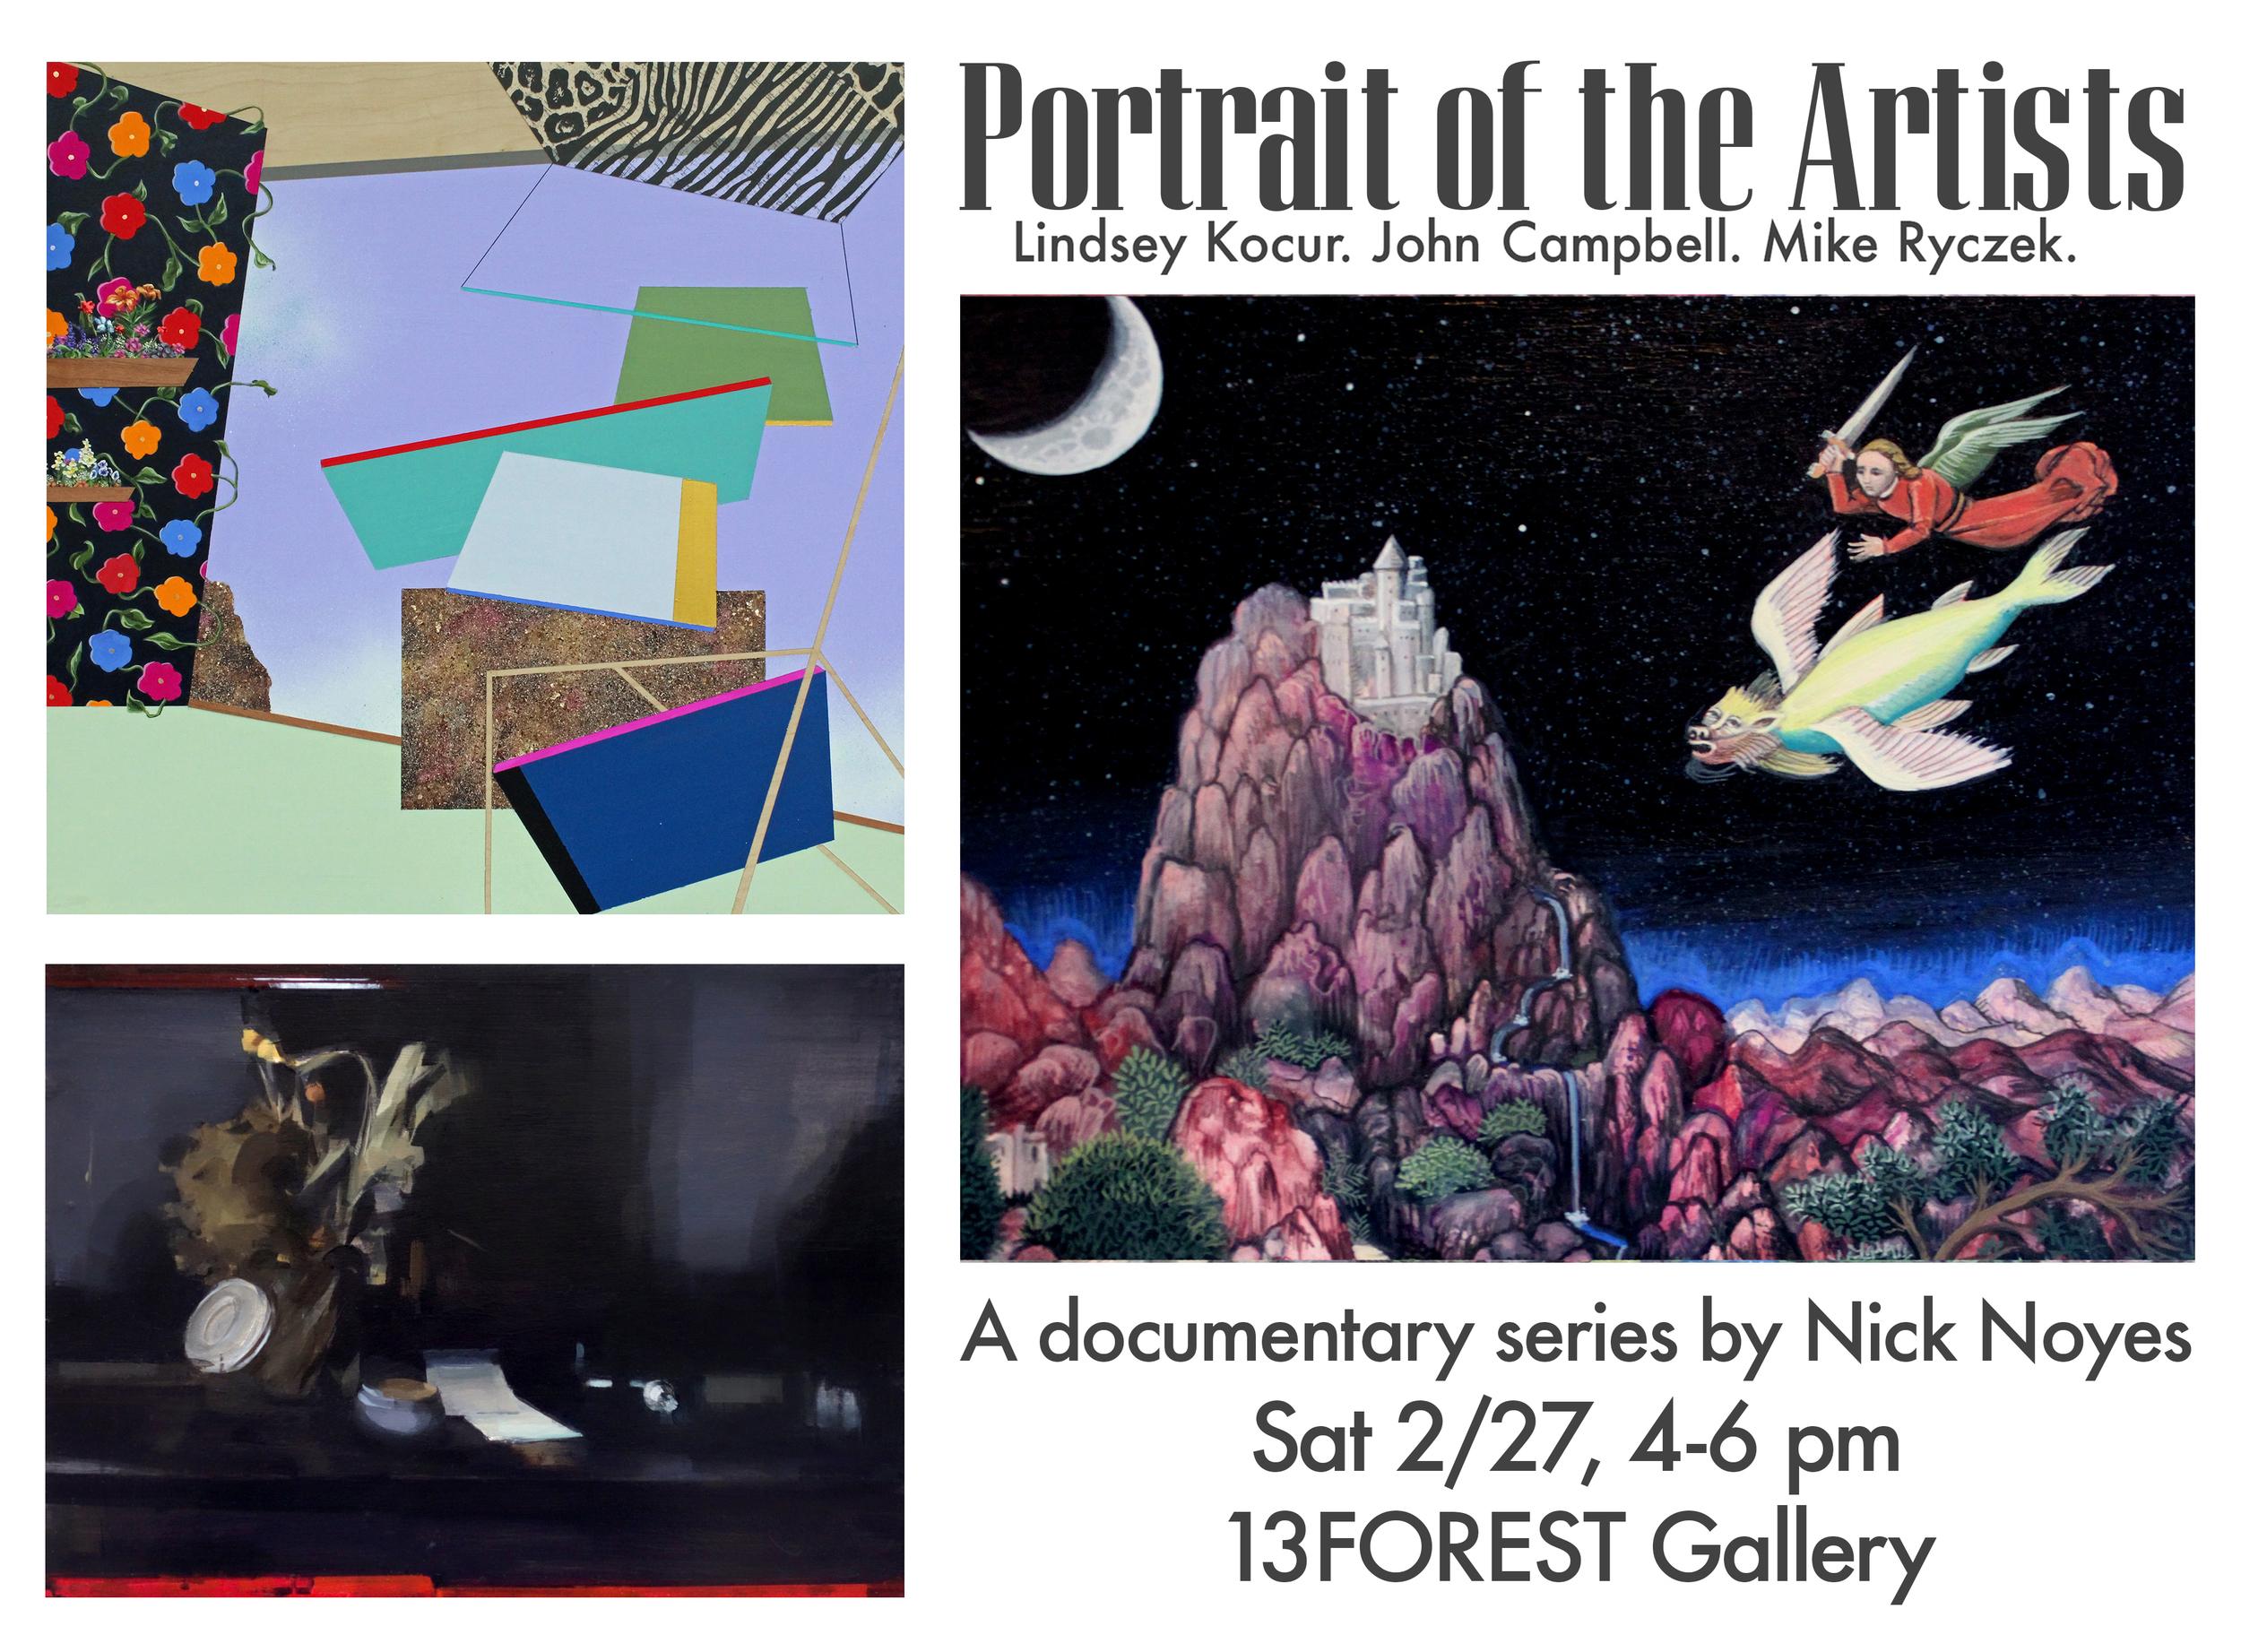 Clockwise from top left: Lindsey Kocur,  Instant #6 ; John Campbell,  The Greater Struggle  (detail);Mike Ryczek,  Gestalt_3